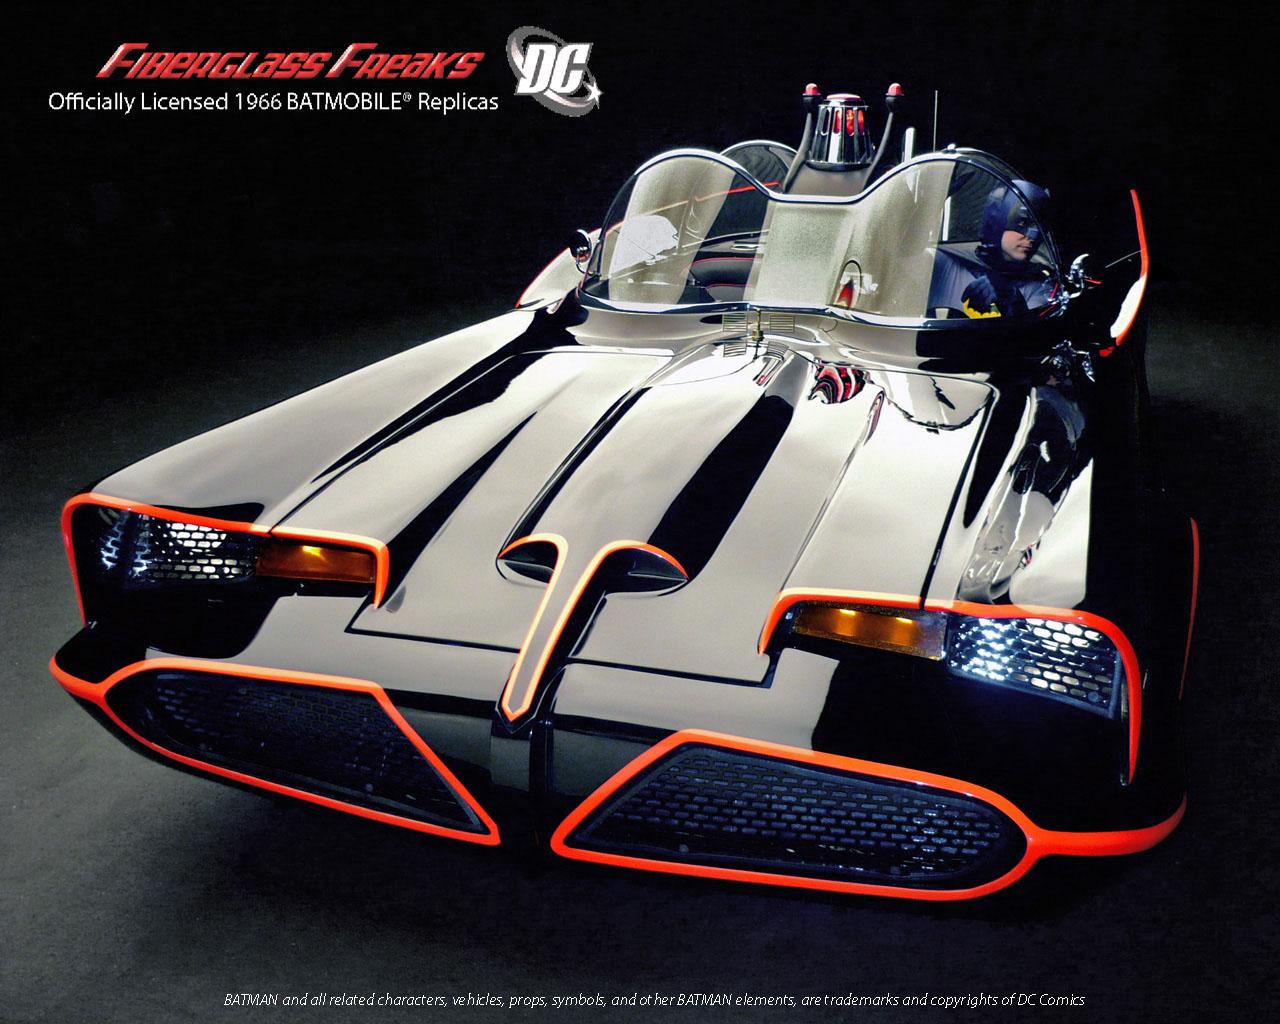 http://1.bp.blogspot.com/_2Wbp28ye5MY/TPFB_8KPKQI/AAAAAAAAOs8/fXkUUIheXOs/s1600/Fiberglass_Freaks-Batmobile-%25E3%2580%2580%25280%2529.jpg